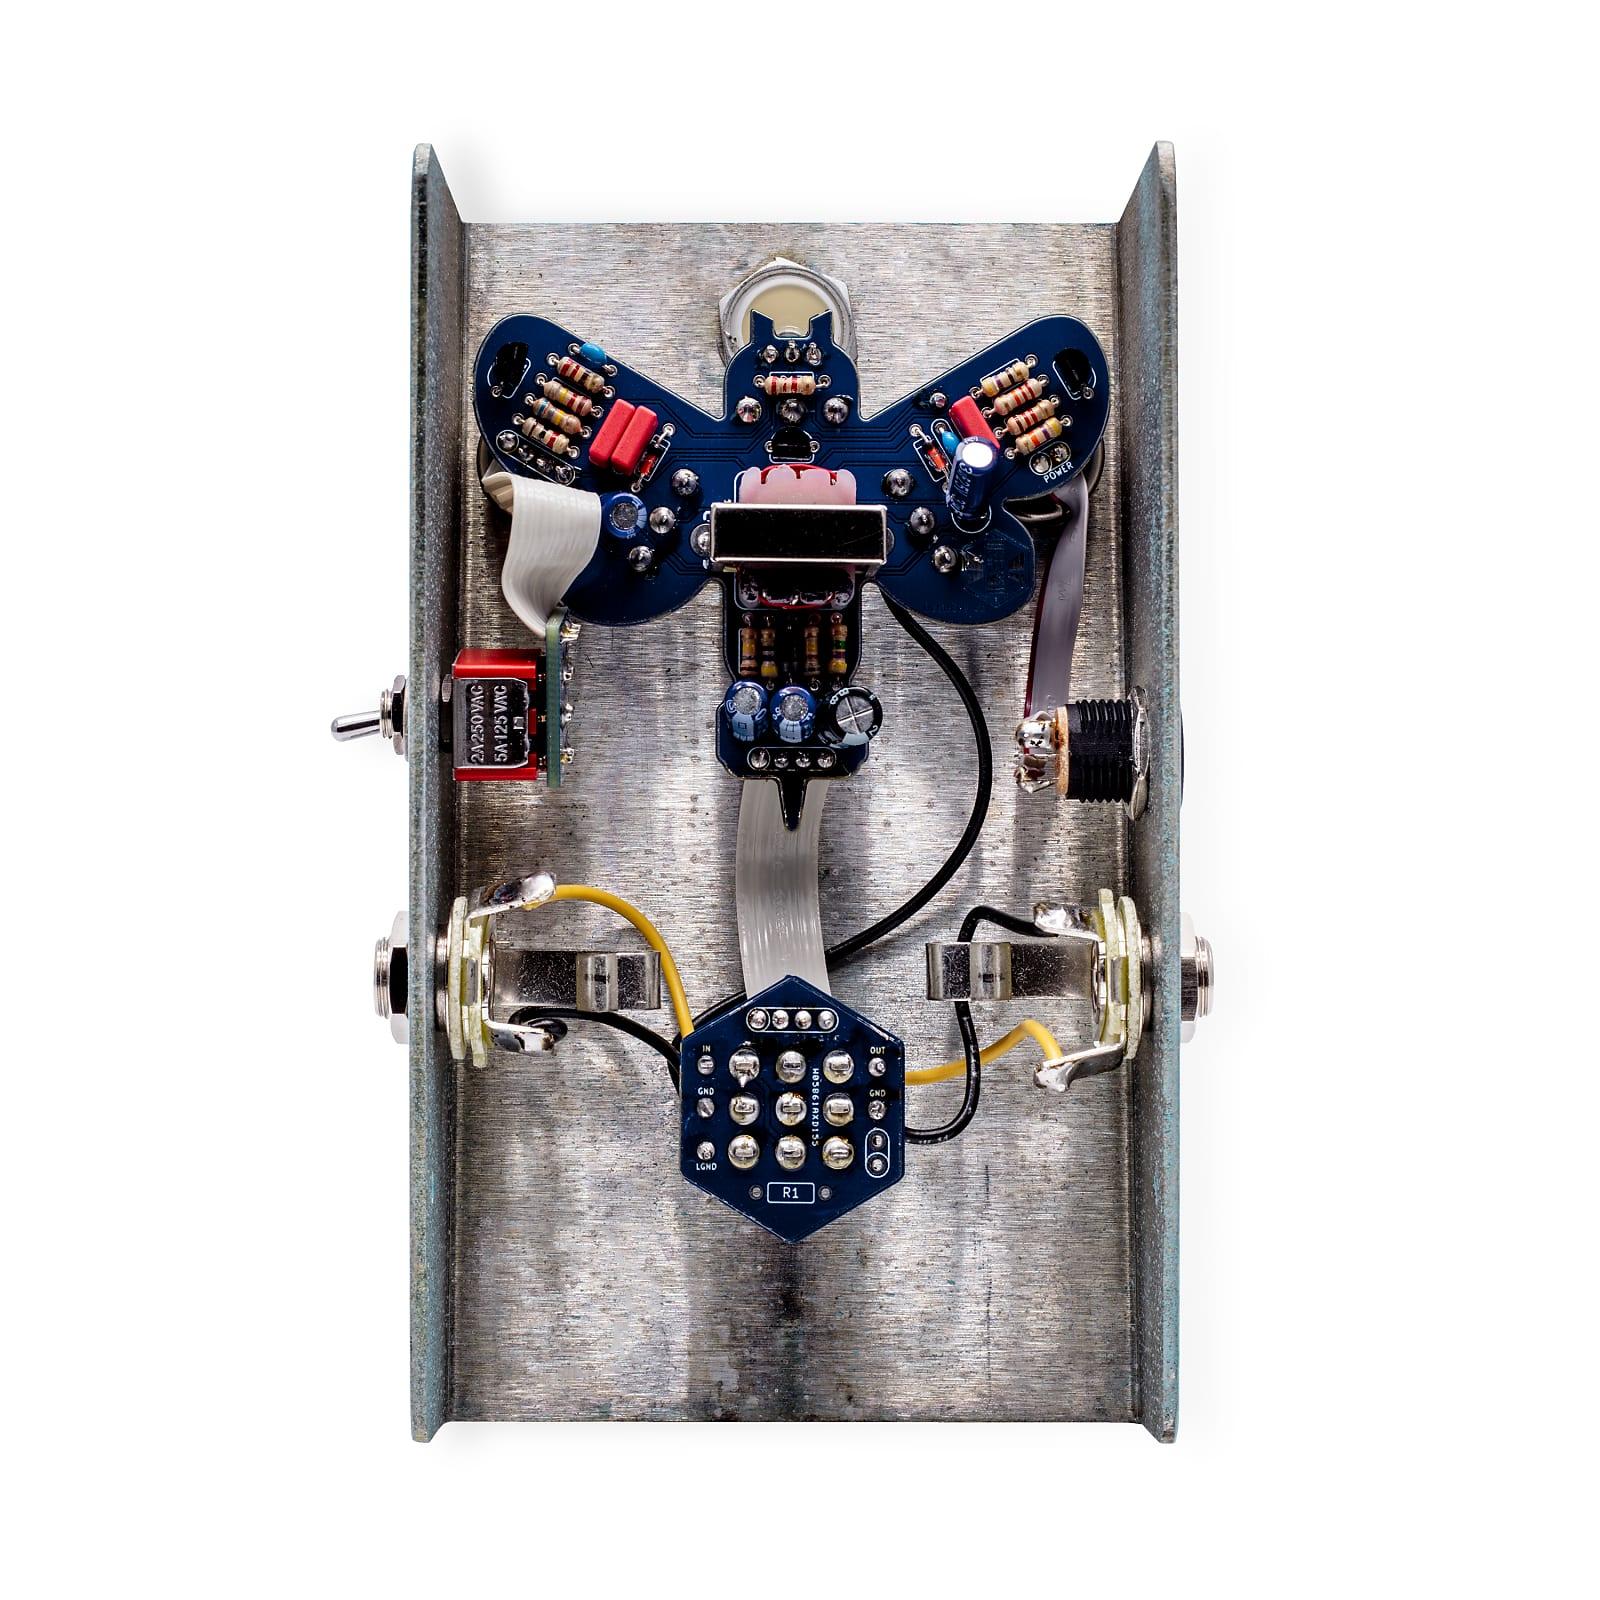 Beetronics Octahive High Octave Fuzz Effects Pedal